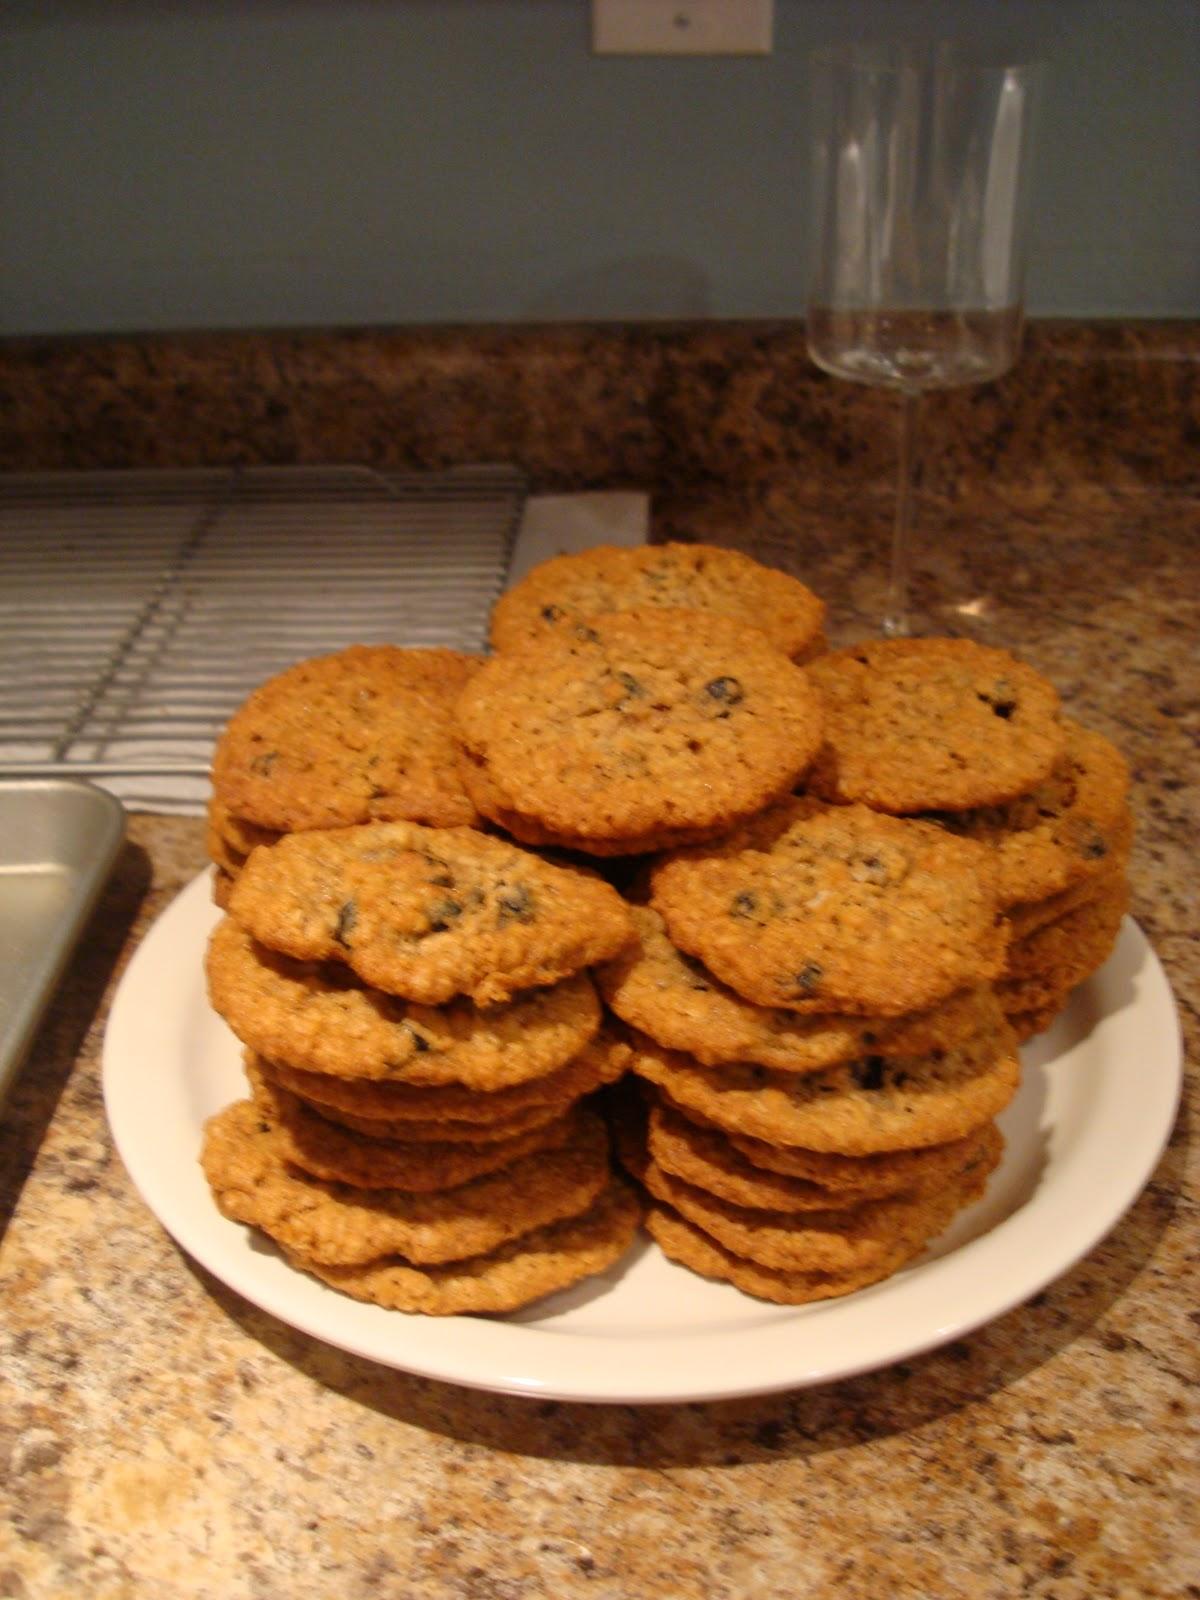 Costco Oatmeal Cookie Recipe